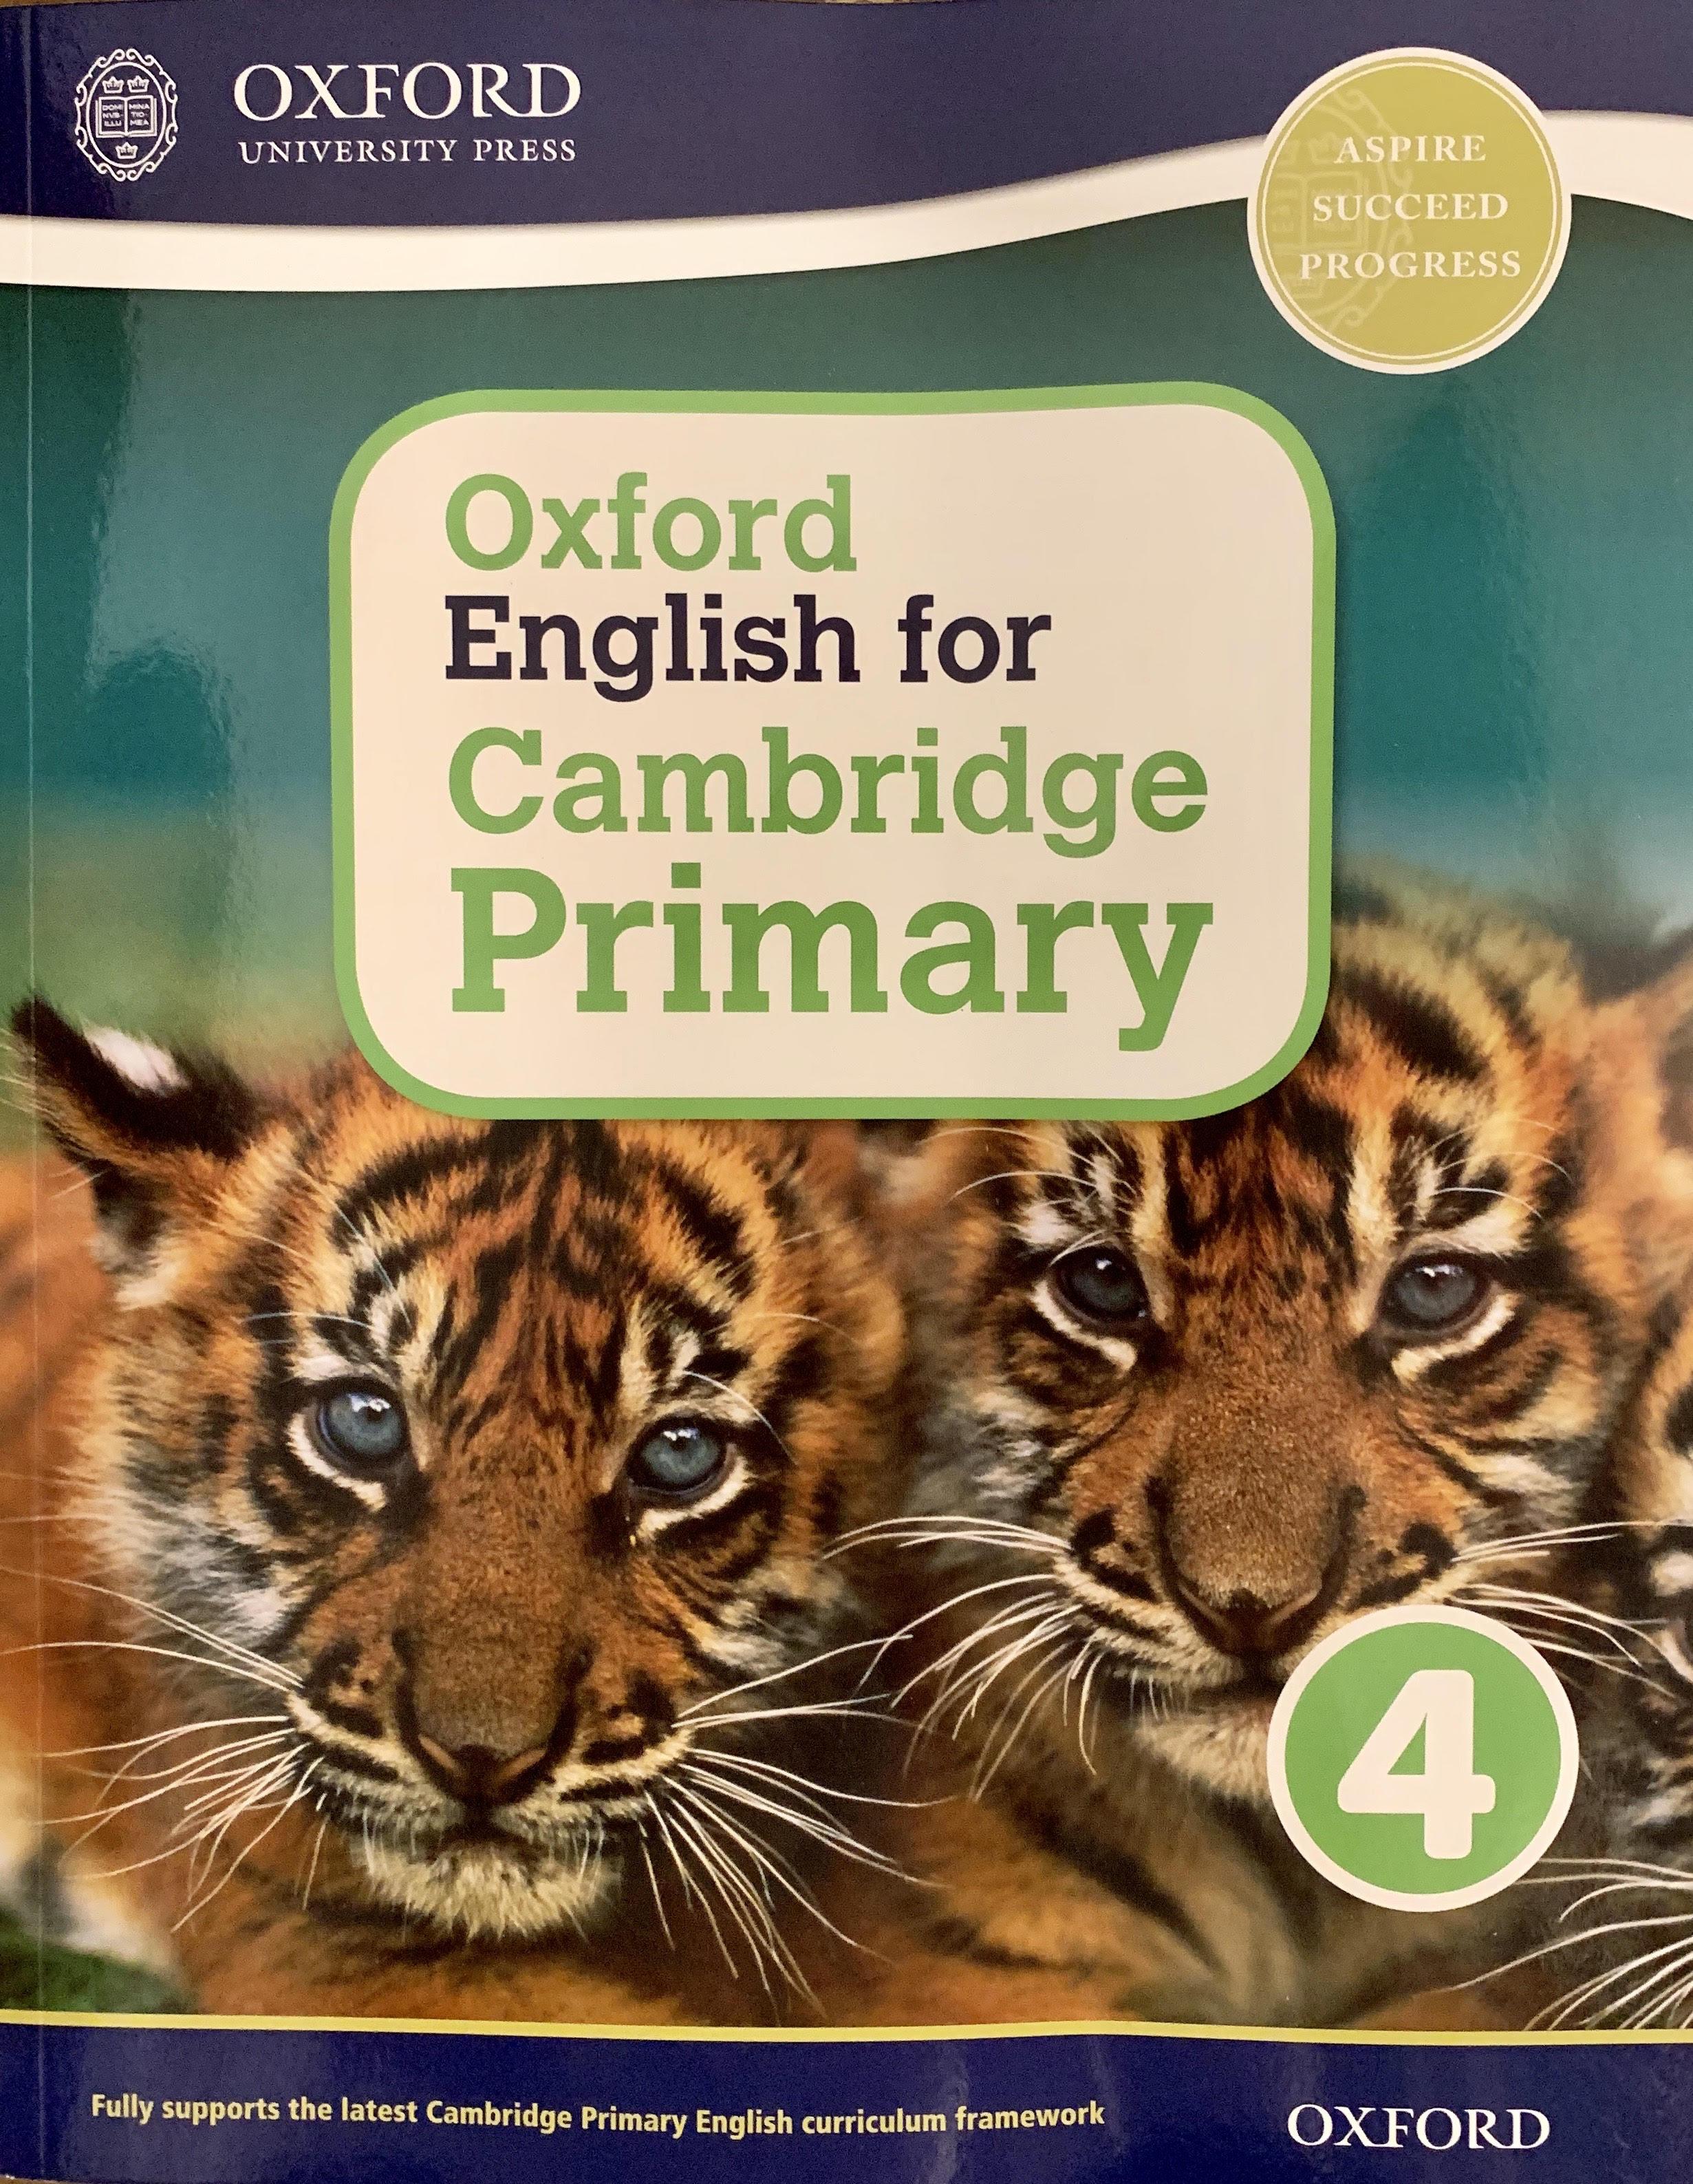 Oxford English for Cambridge Primary 4